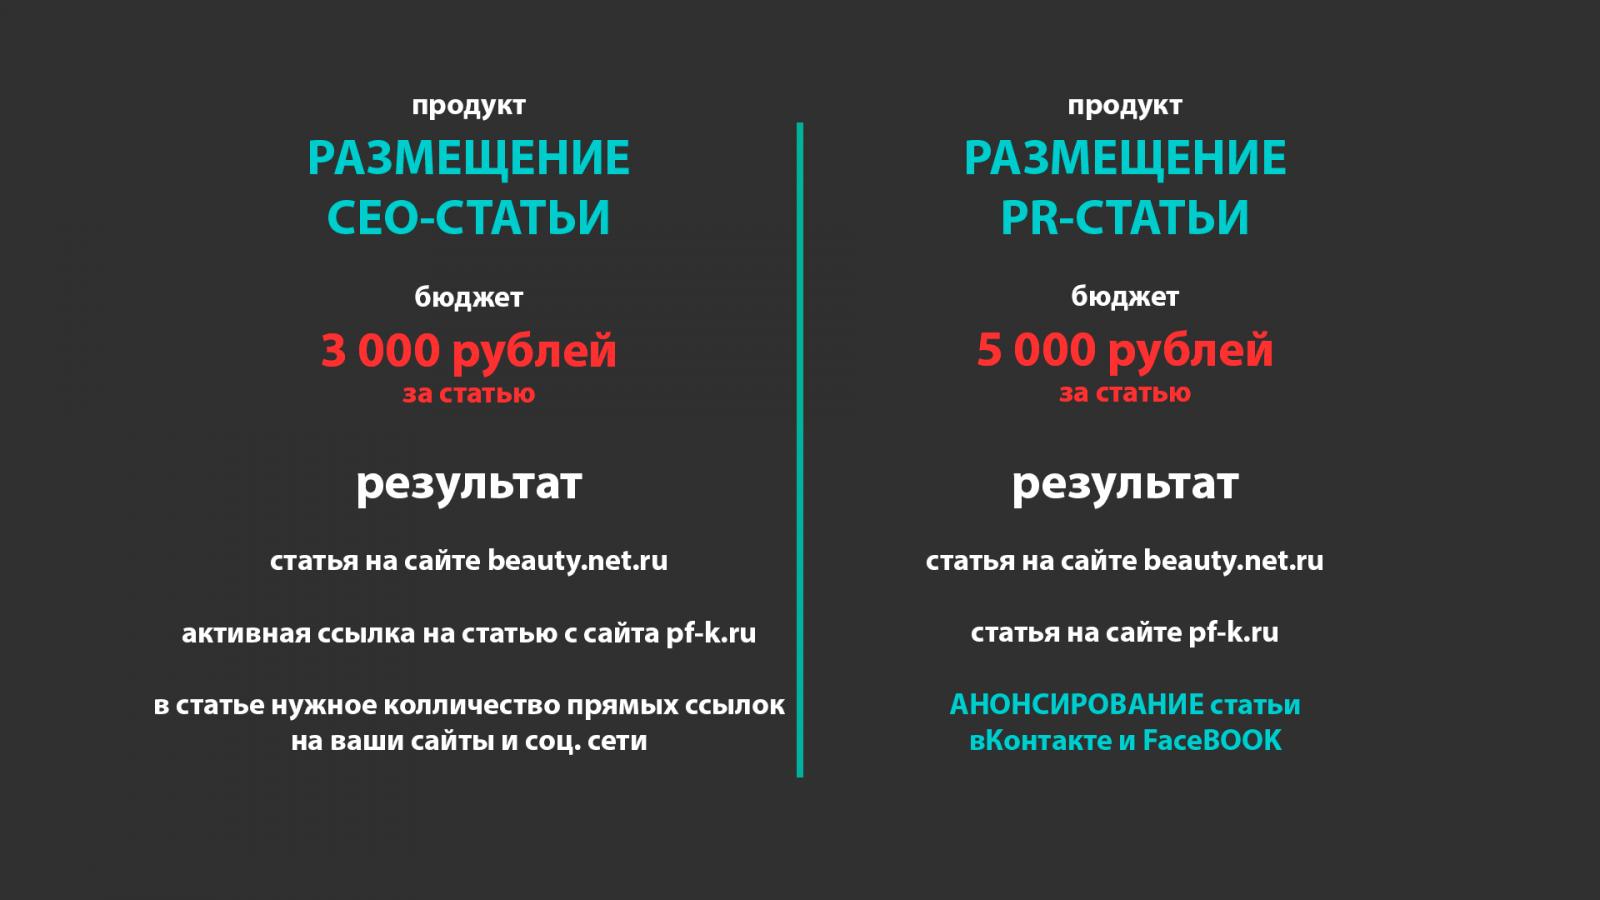 930 Презентация ЯКОСМЕТОЛОГ статьи.png